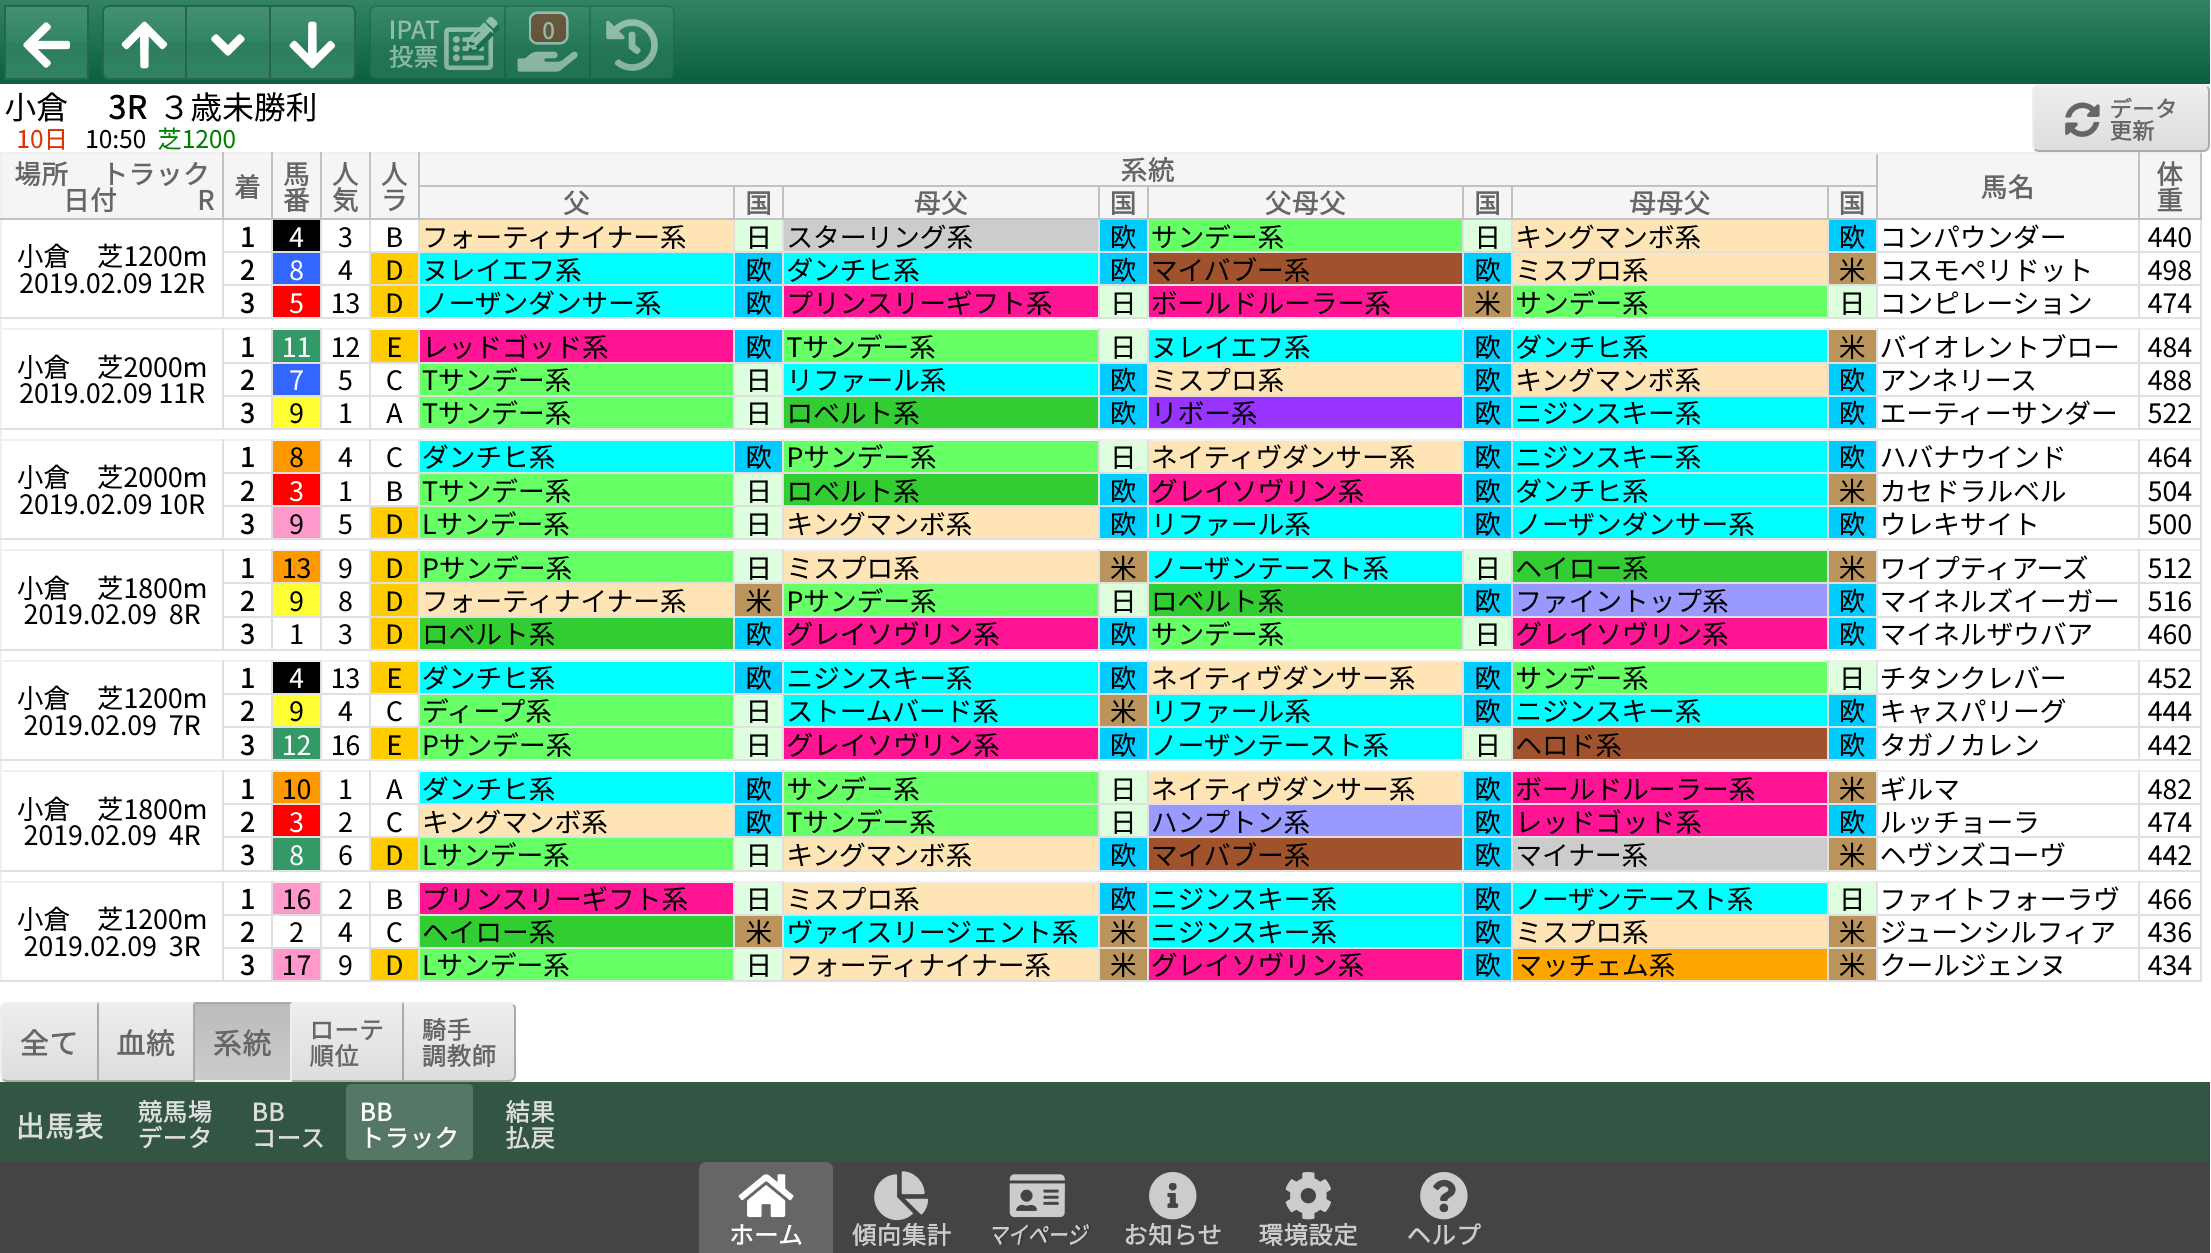 2/9(土)小倉競馬 1~3着内好走馬の傾向(血統・系統・ローテ・パターン・騎手・調教師)